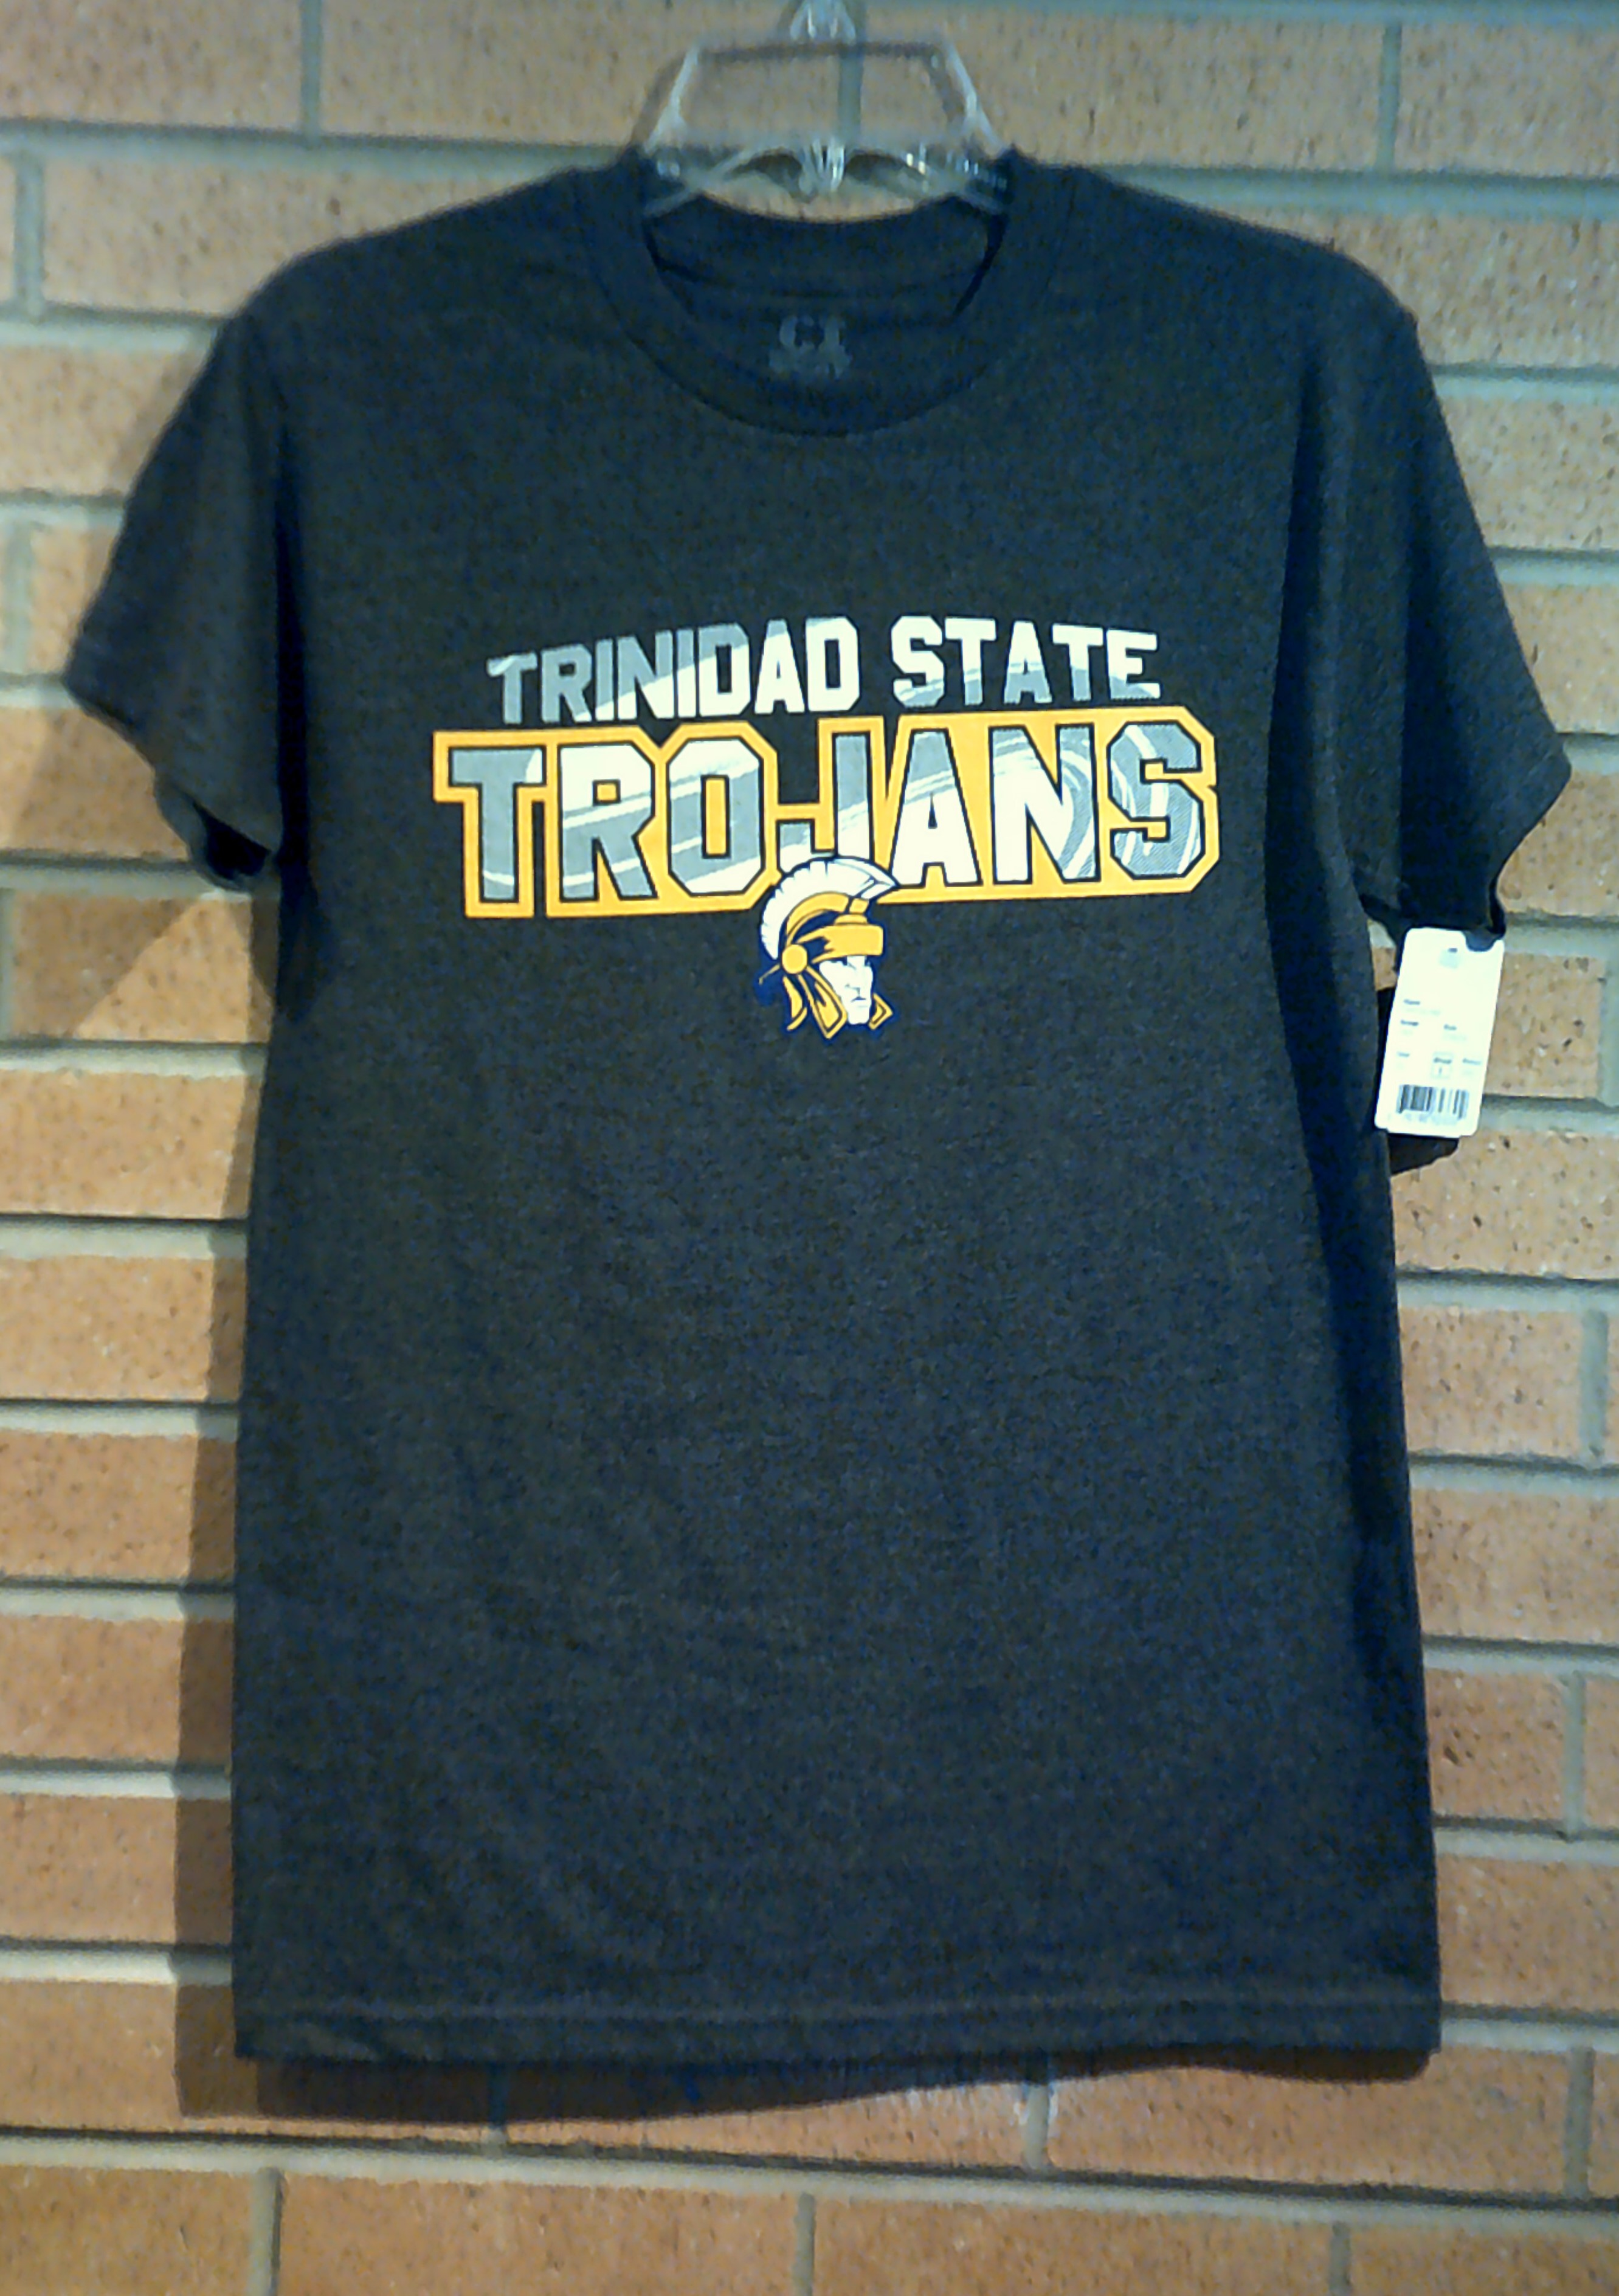 Trindad State Trojans T-shirt